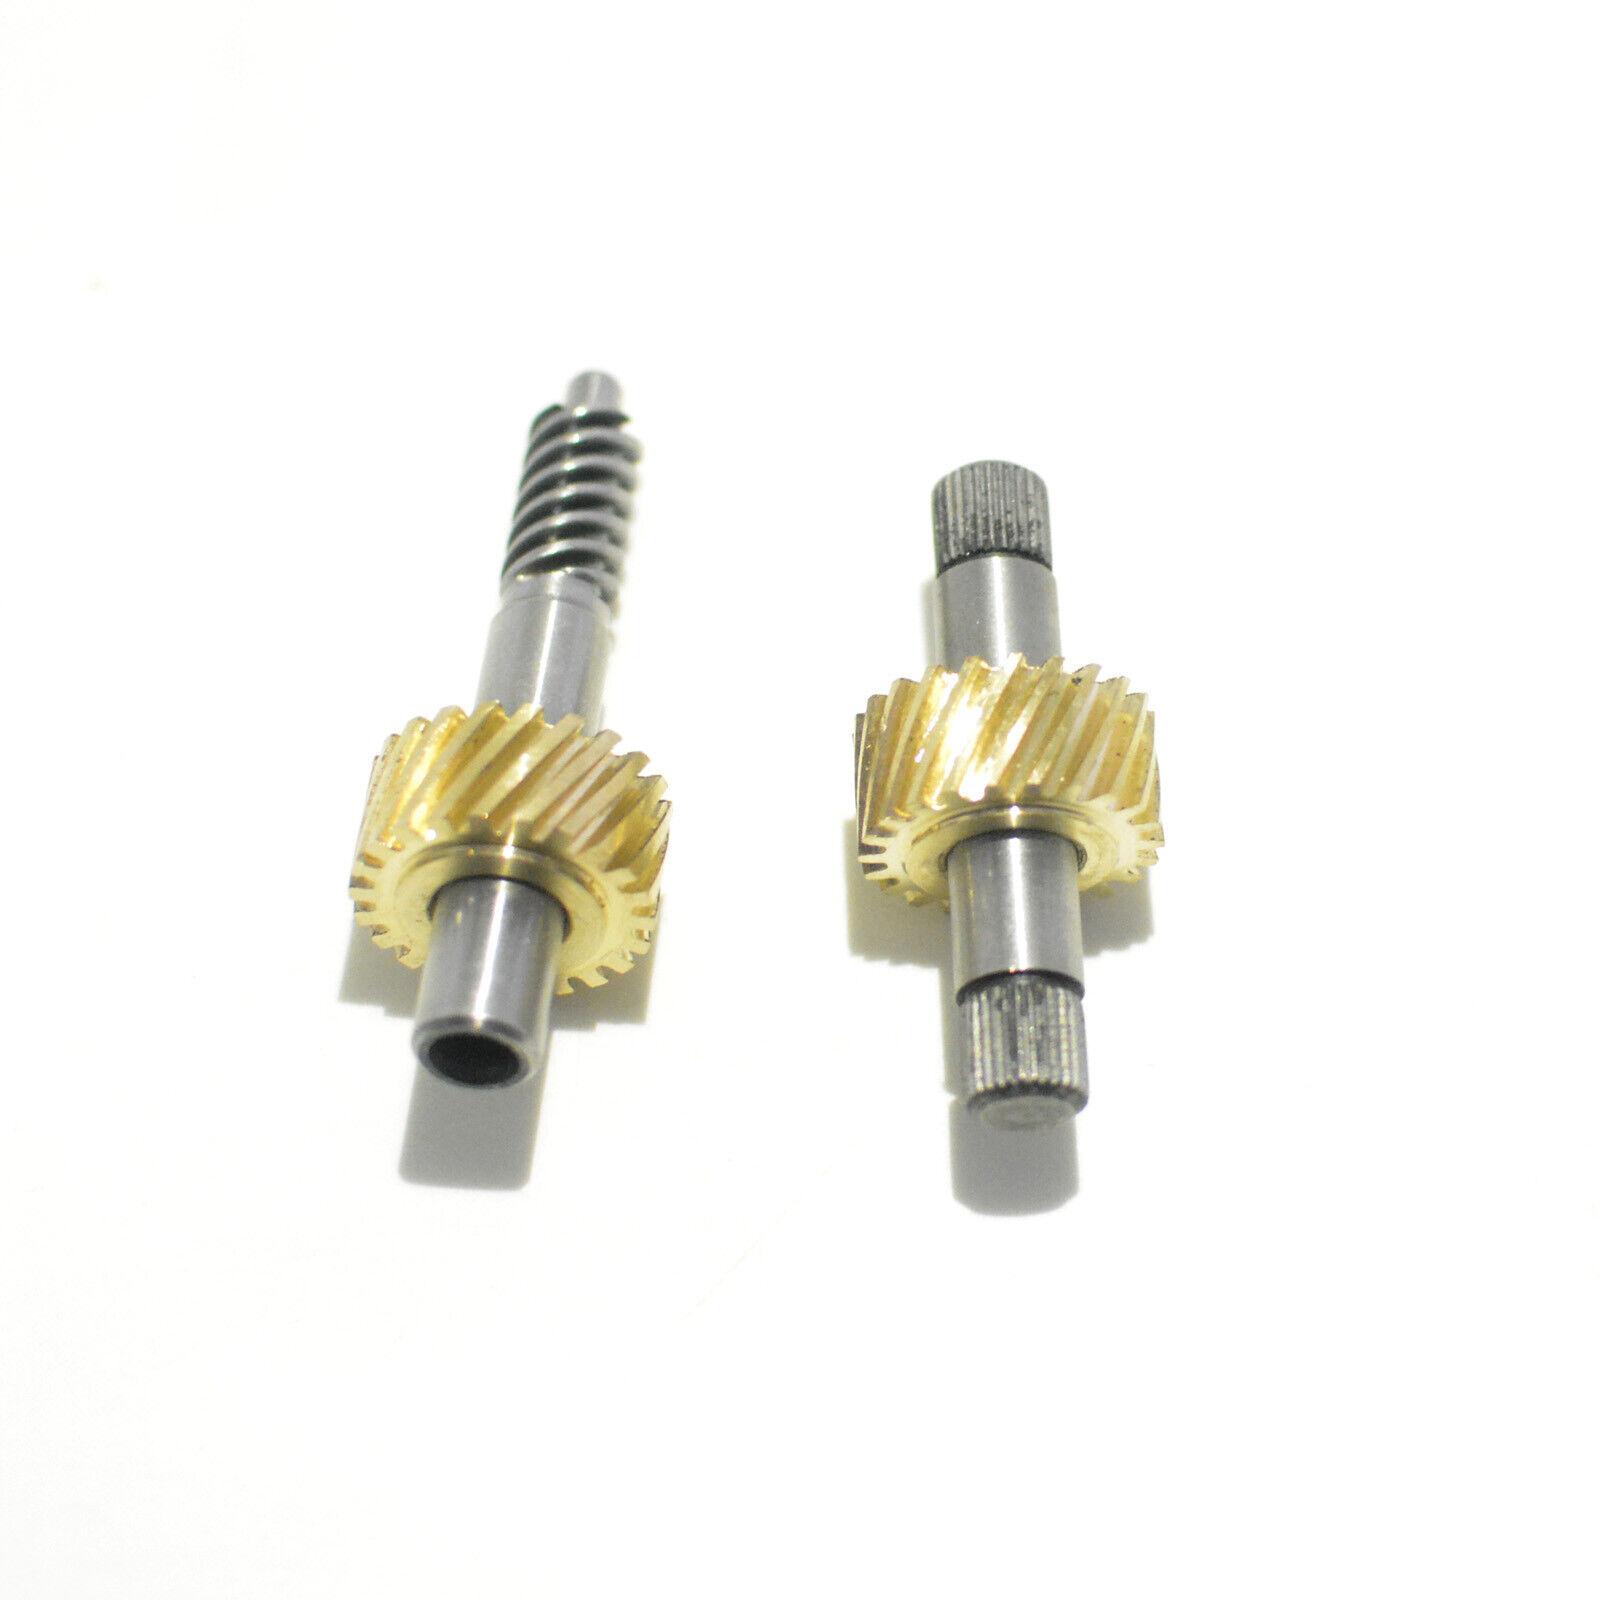 67618370816 Gear repair for bmw 3 series convertible top latch motor e46 e64